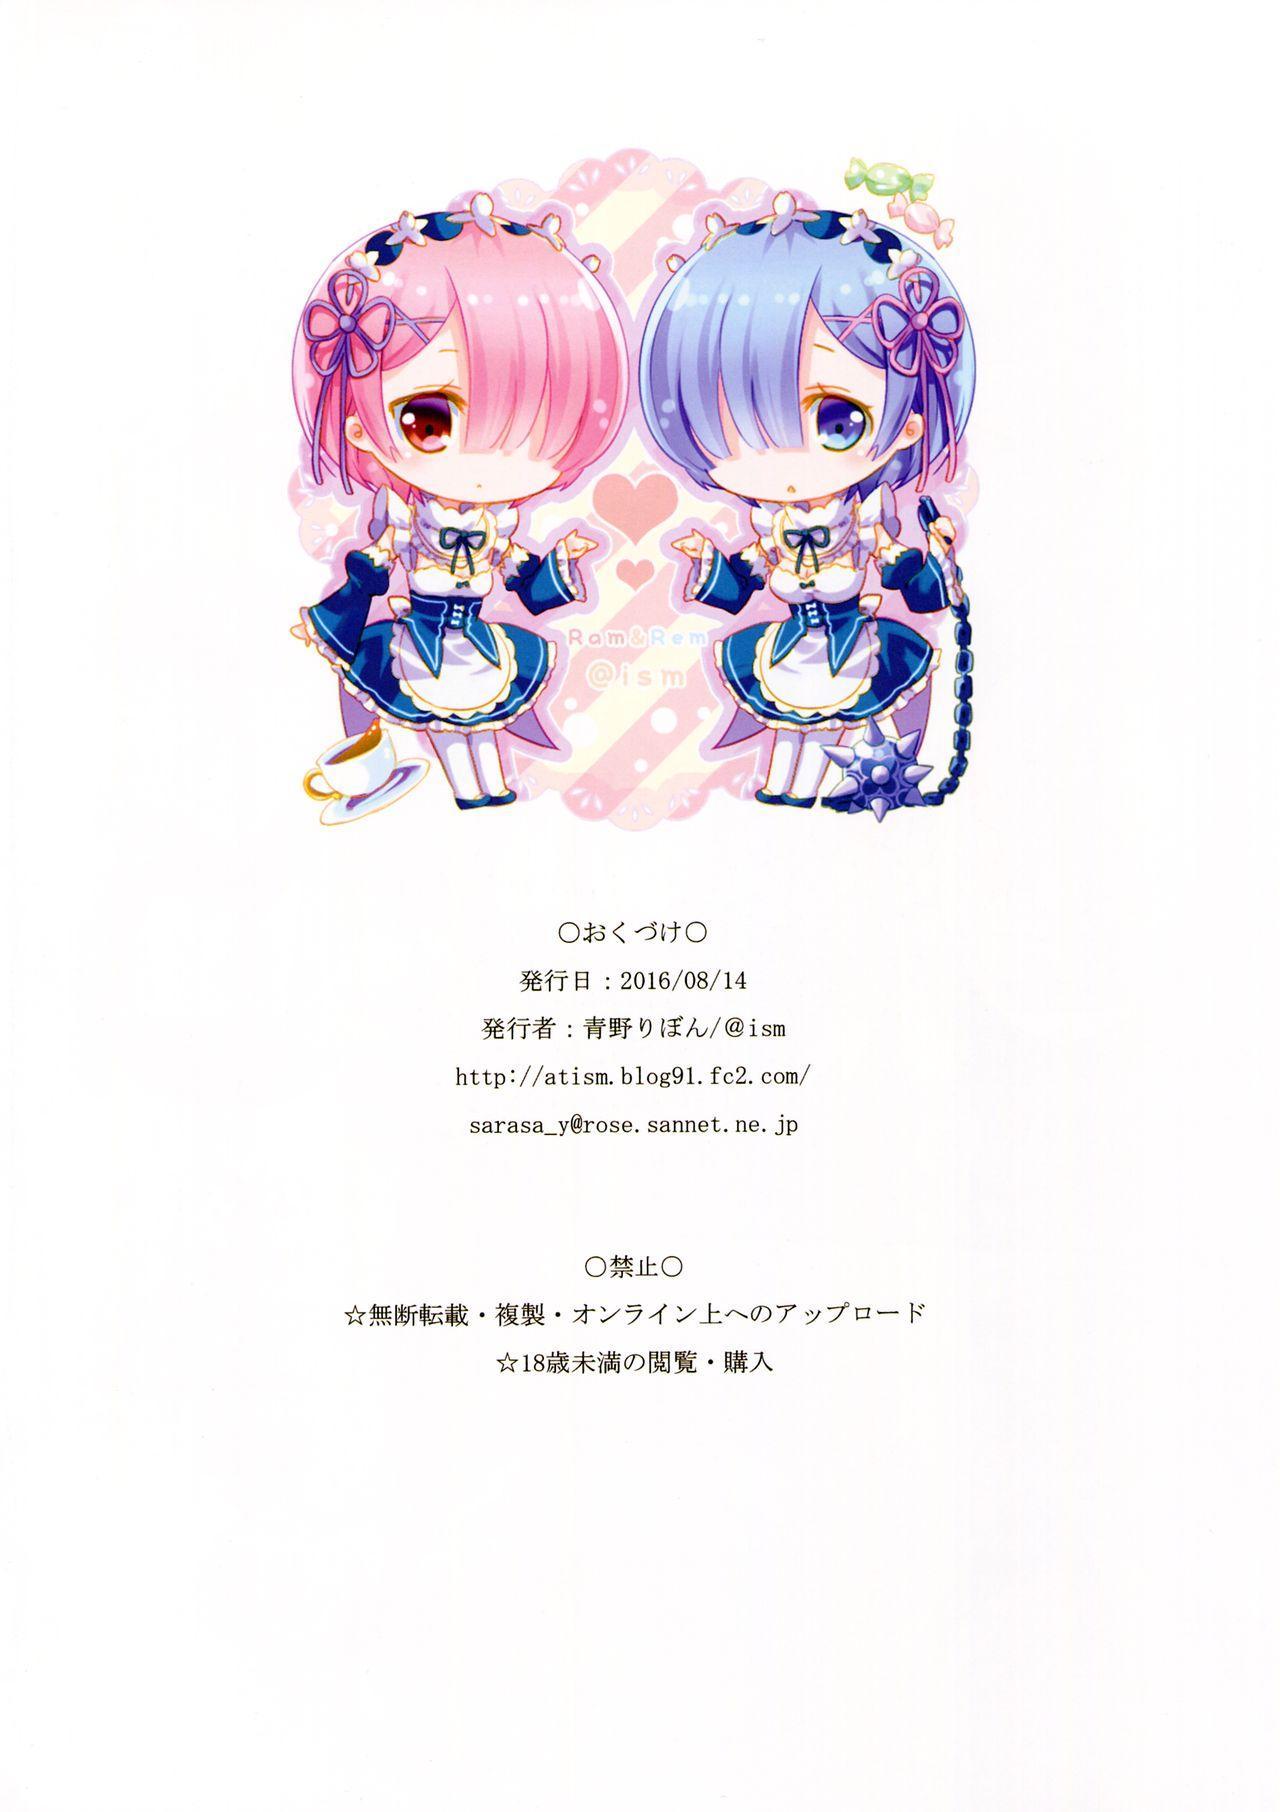 Maid no Oshigoto | Maid's Duty 14